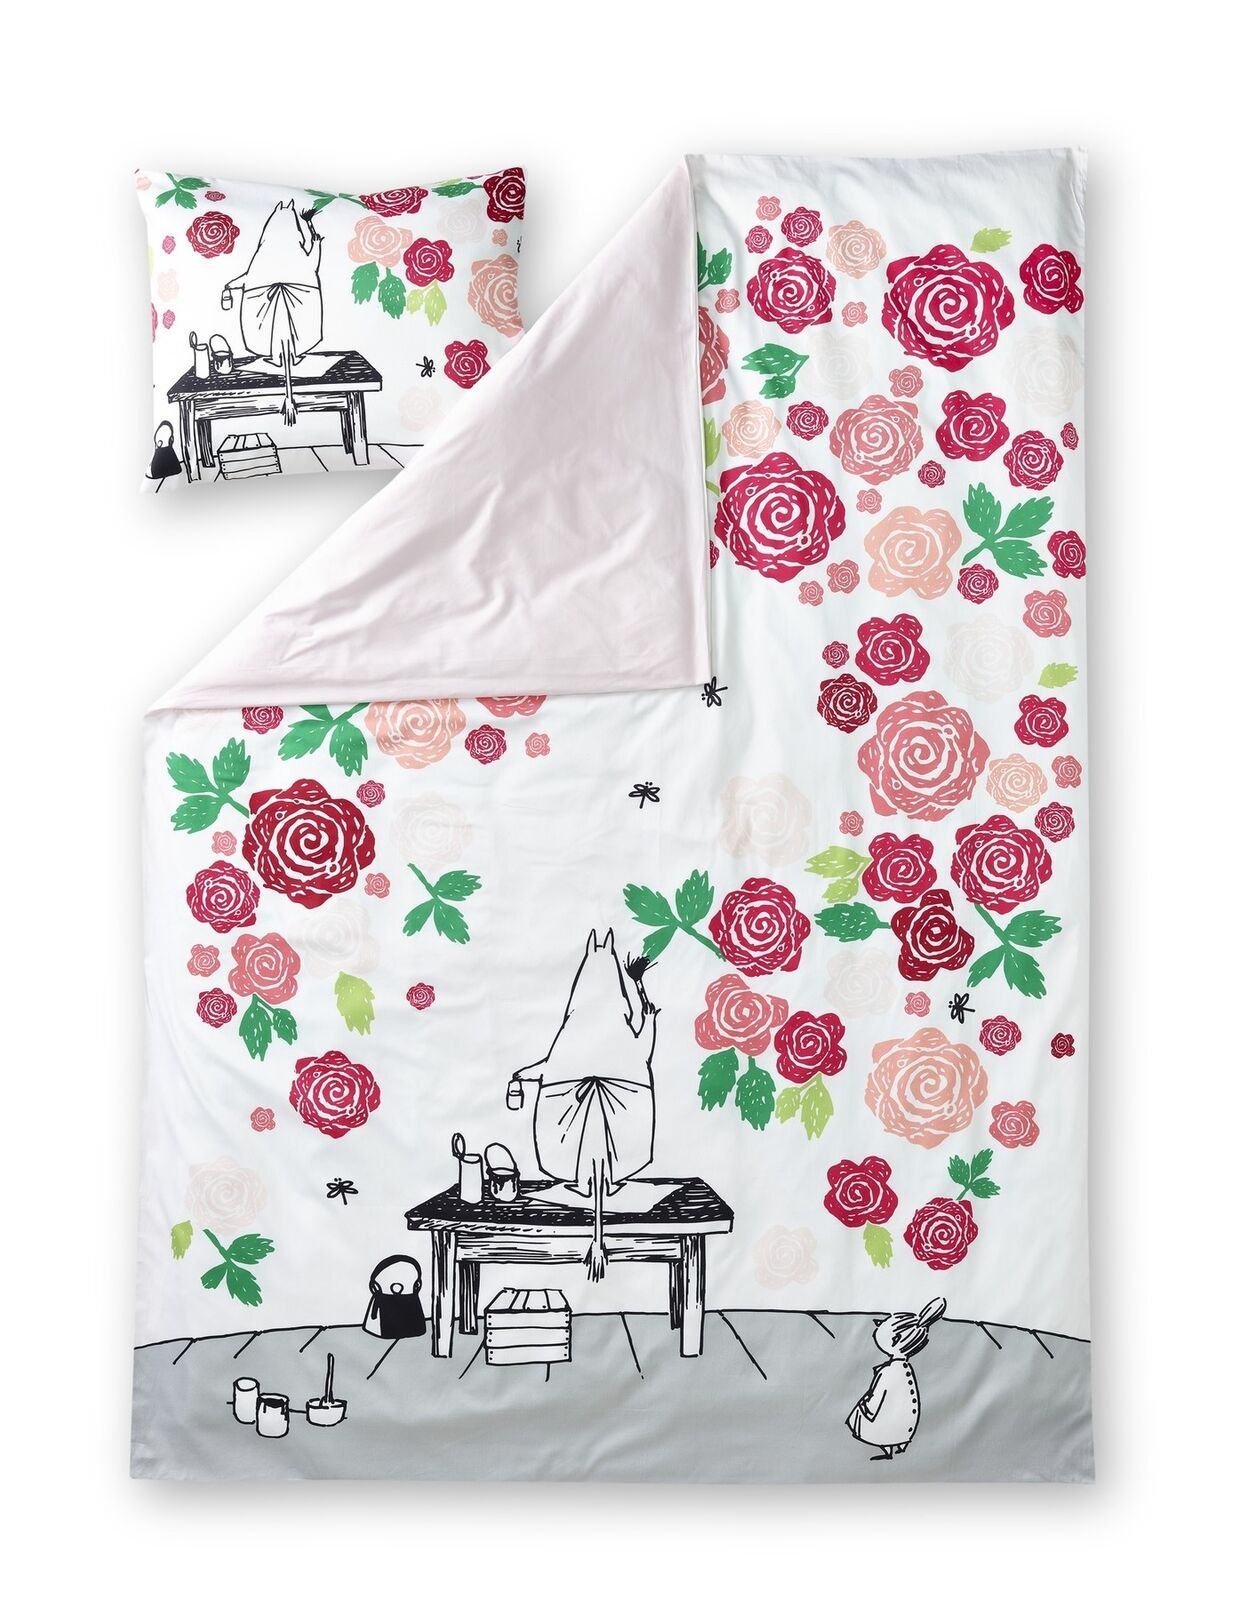 Moomin Sateen Duvet Cover Pillowcase Moominmamma pink Garden 150 x 210 cm